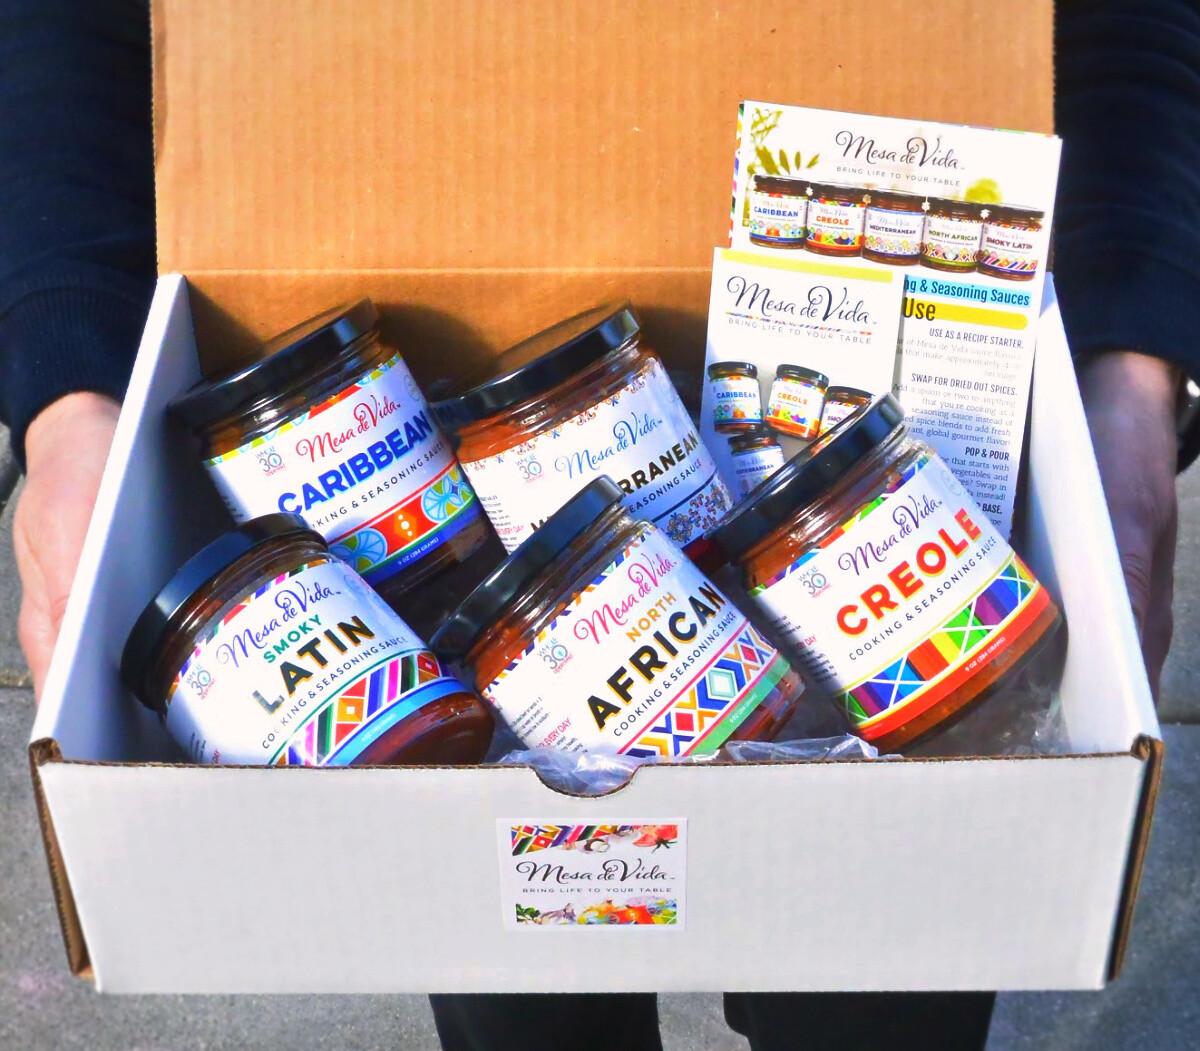 Mesa de Vida 5 Pack Global Gourmet Variety Bundle   Whole30 Approved Cooking Sauce